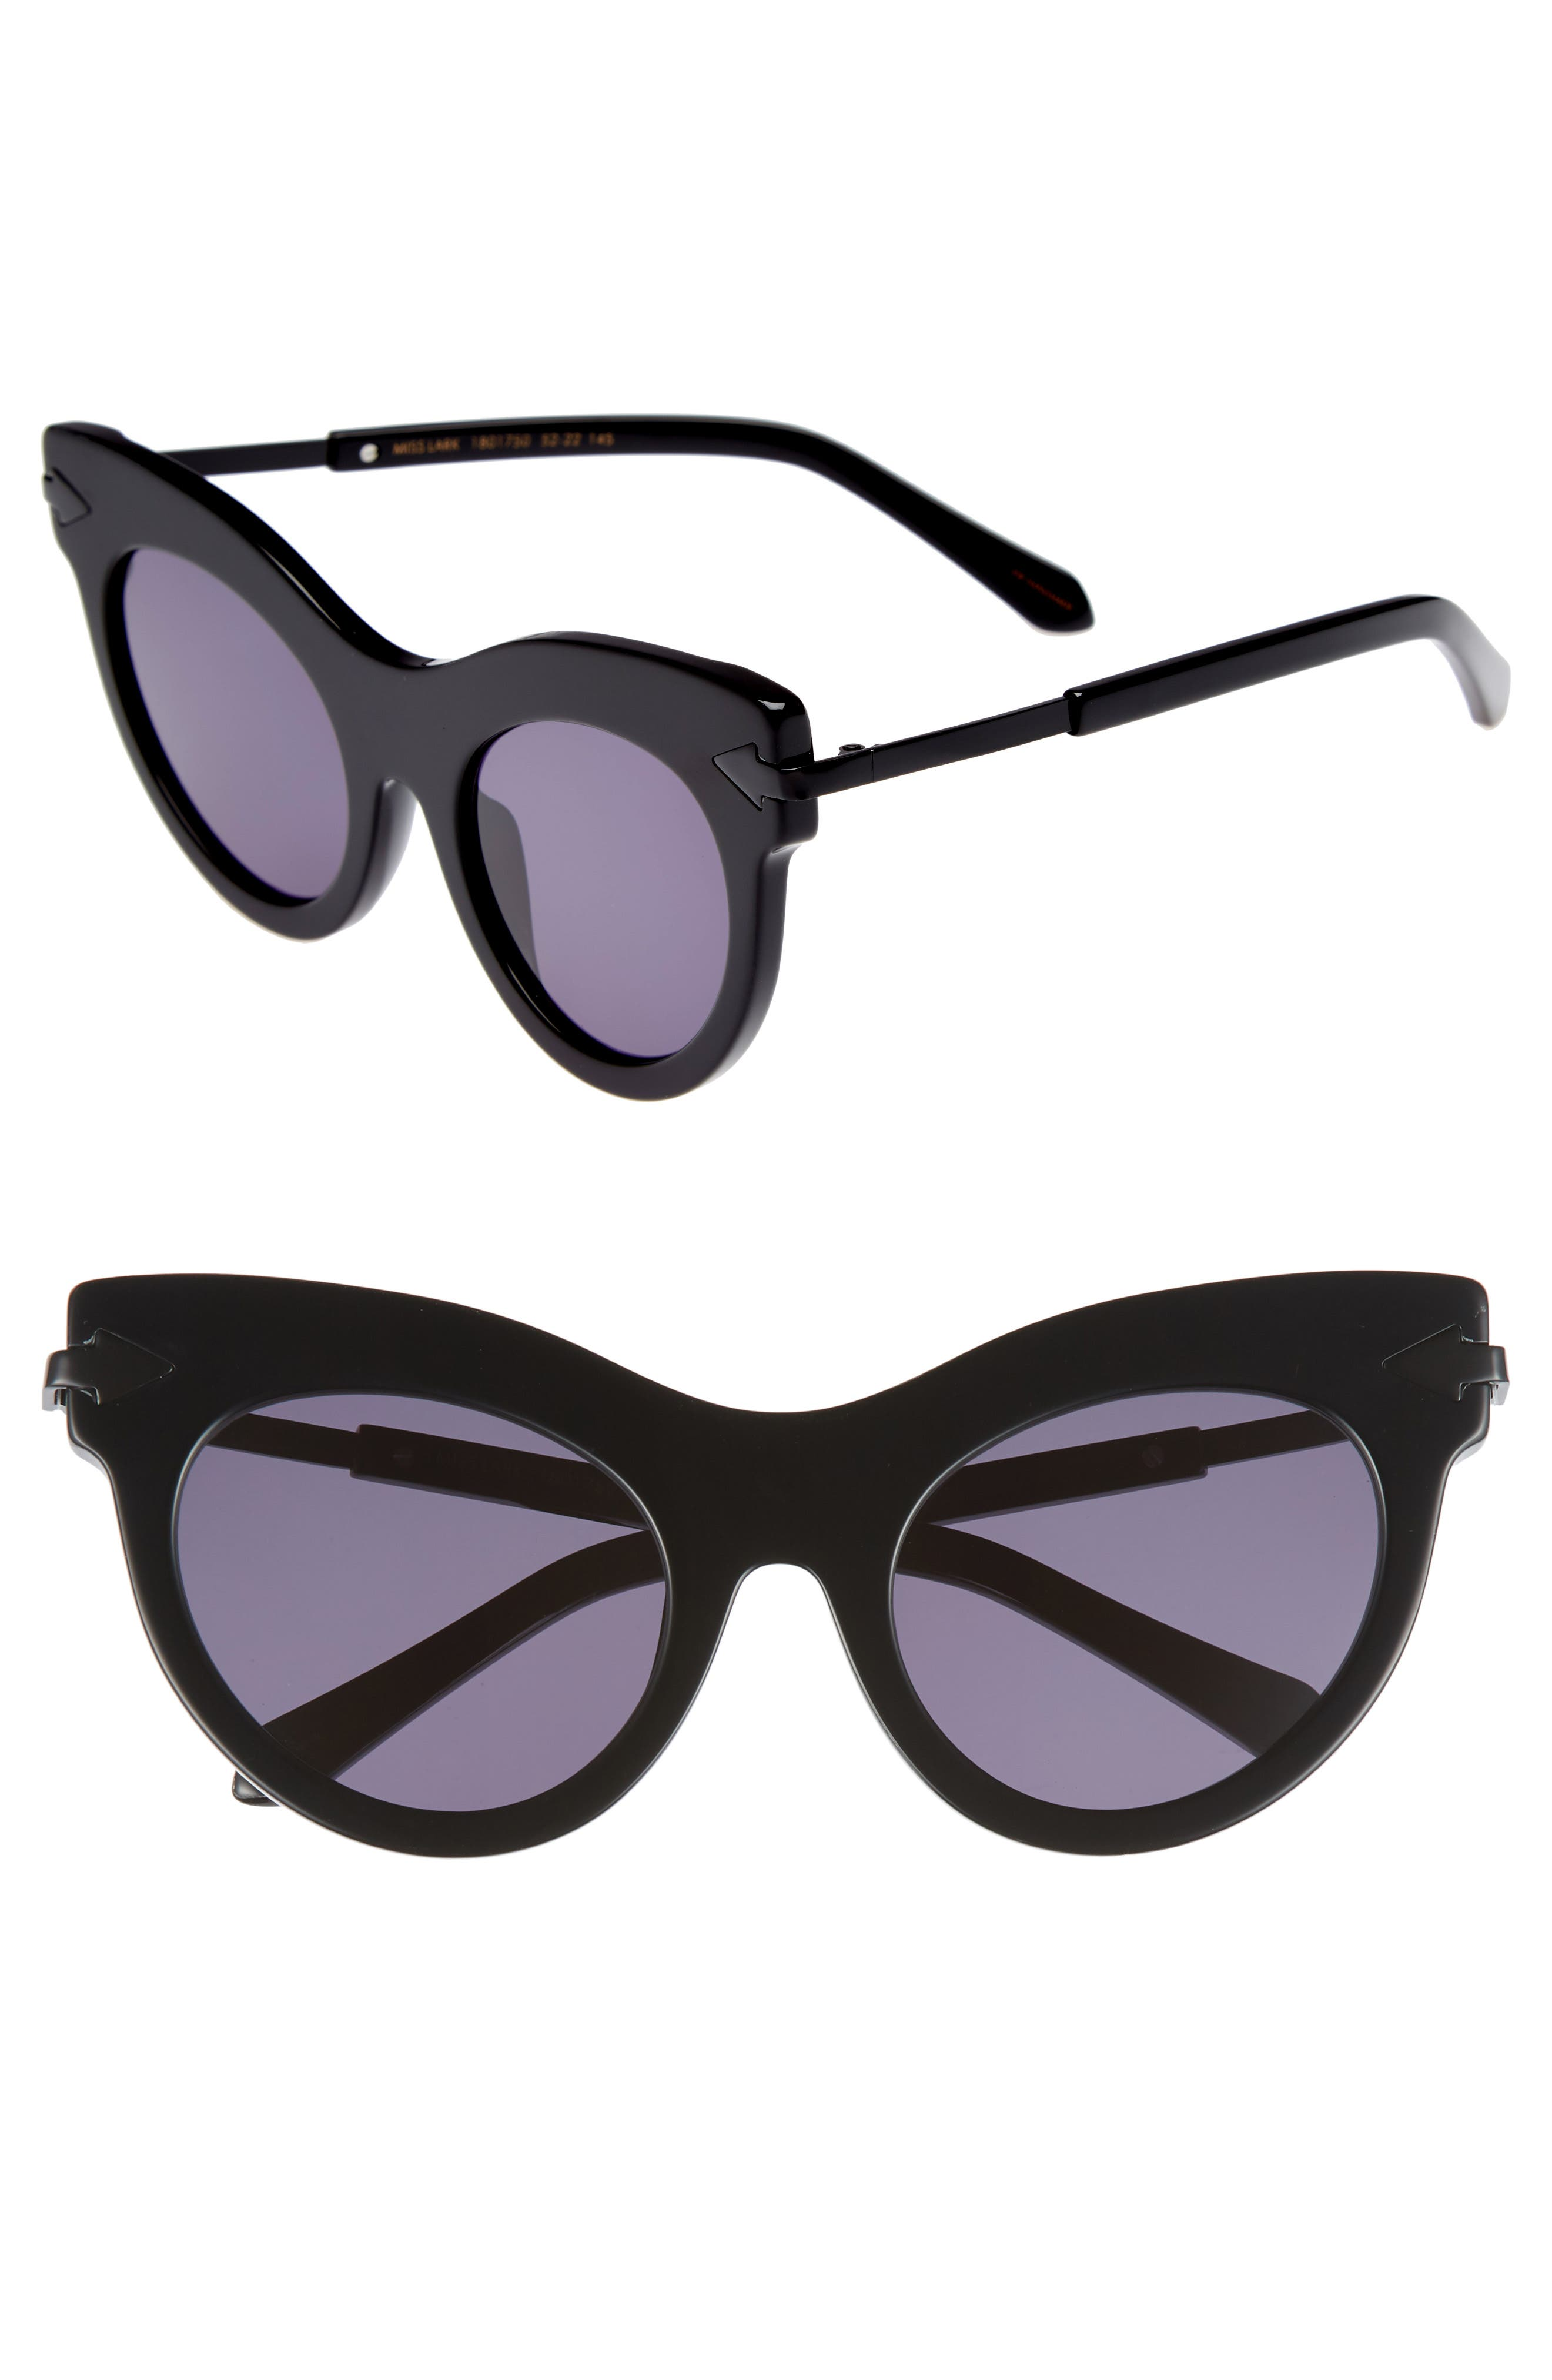 Miss Lark 52mm Cat Eye Sunglasses,                         Main,                         color, BLACK